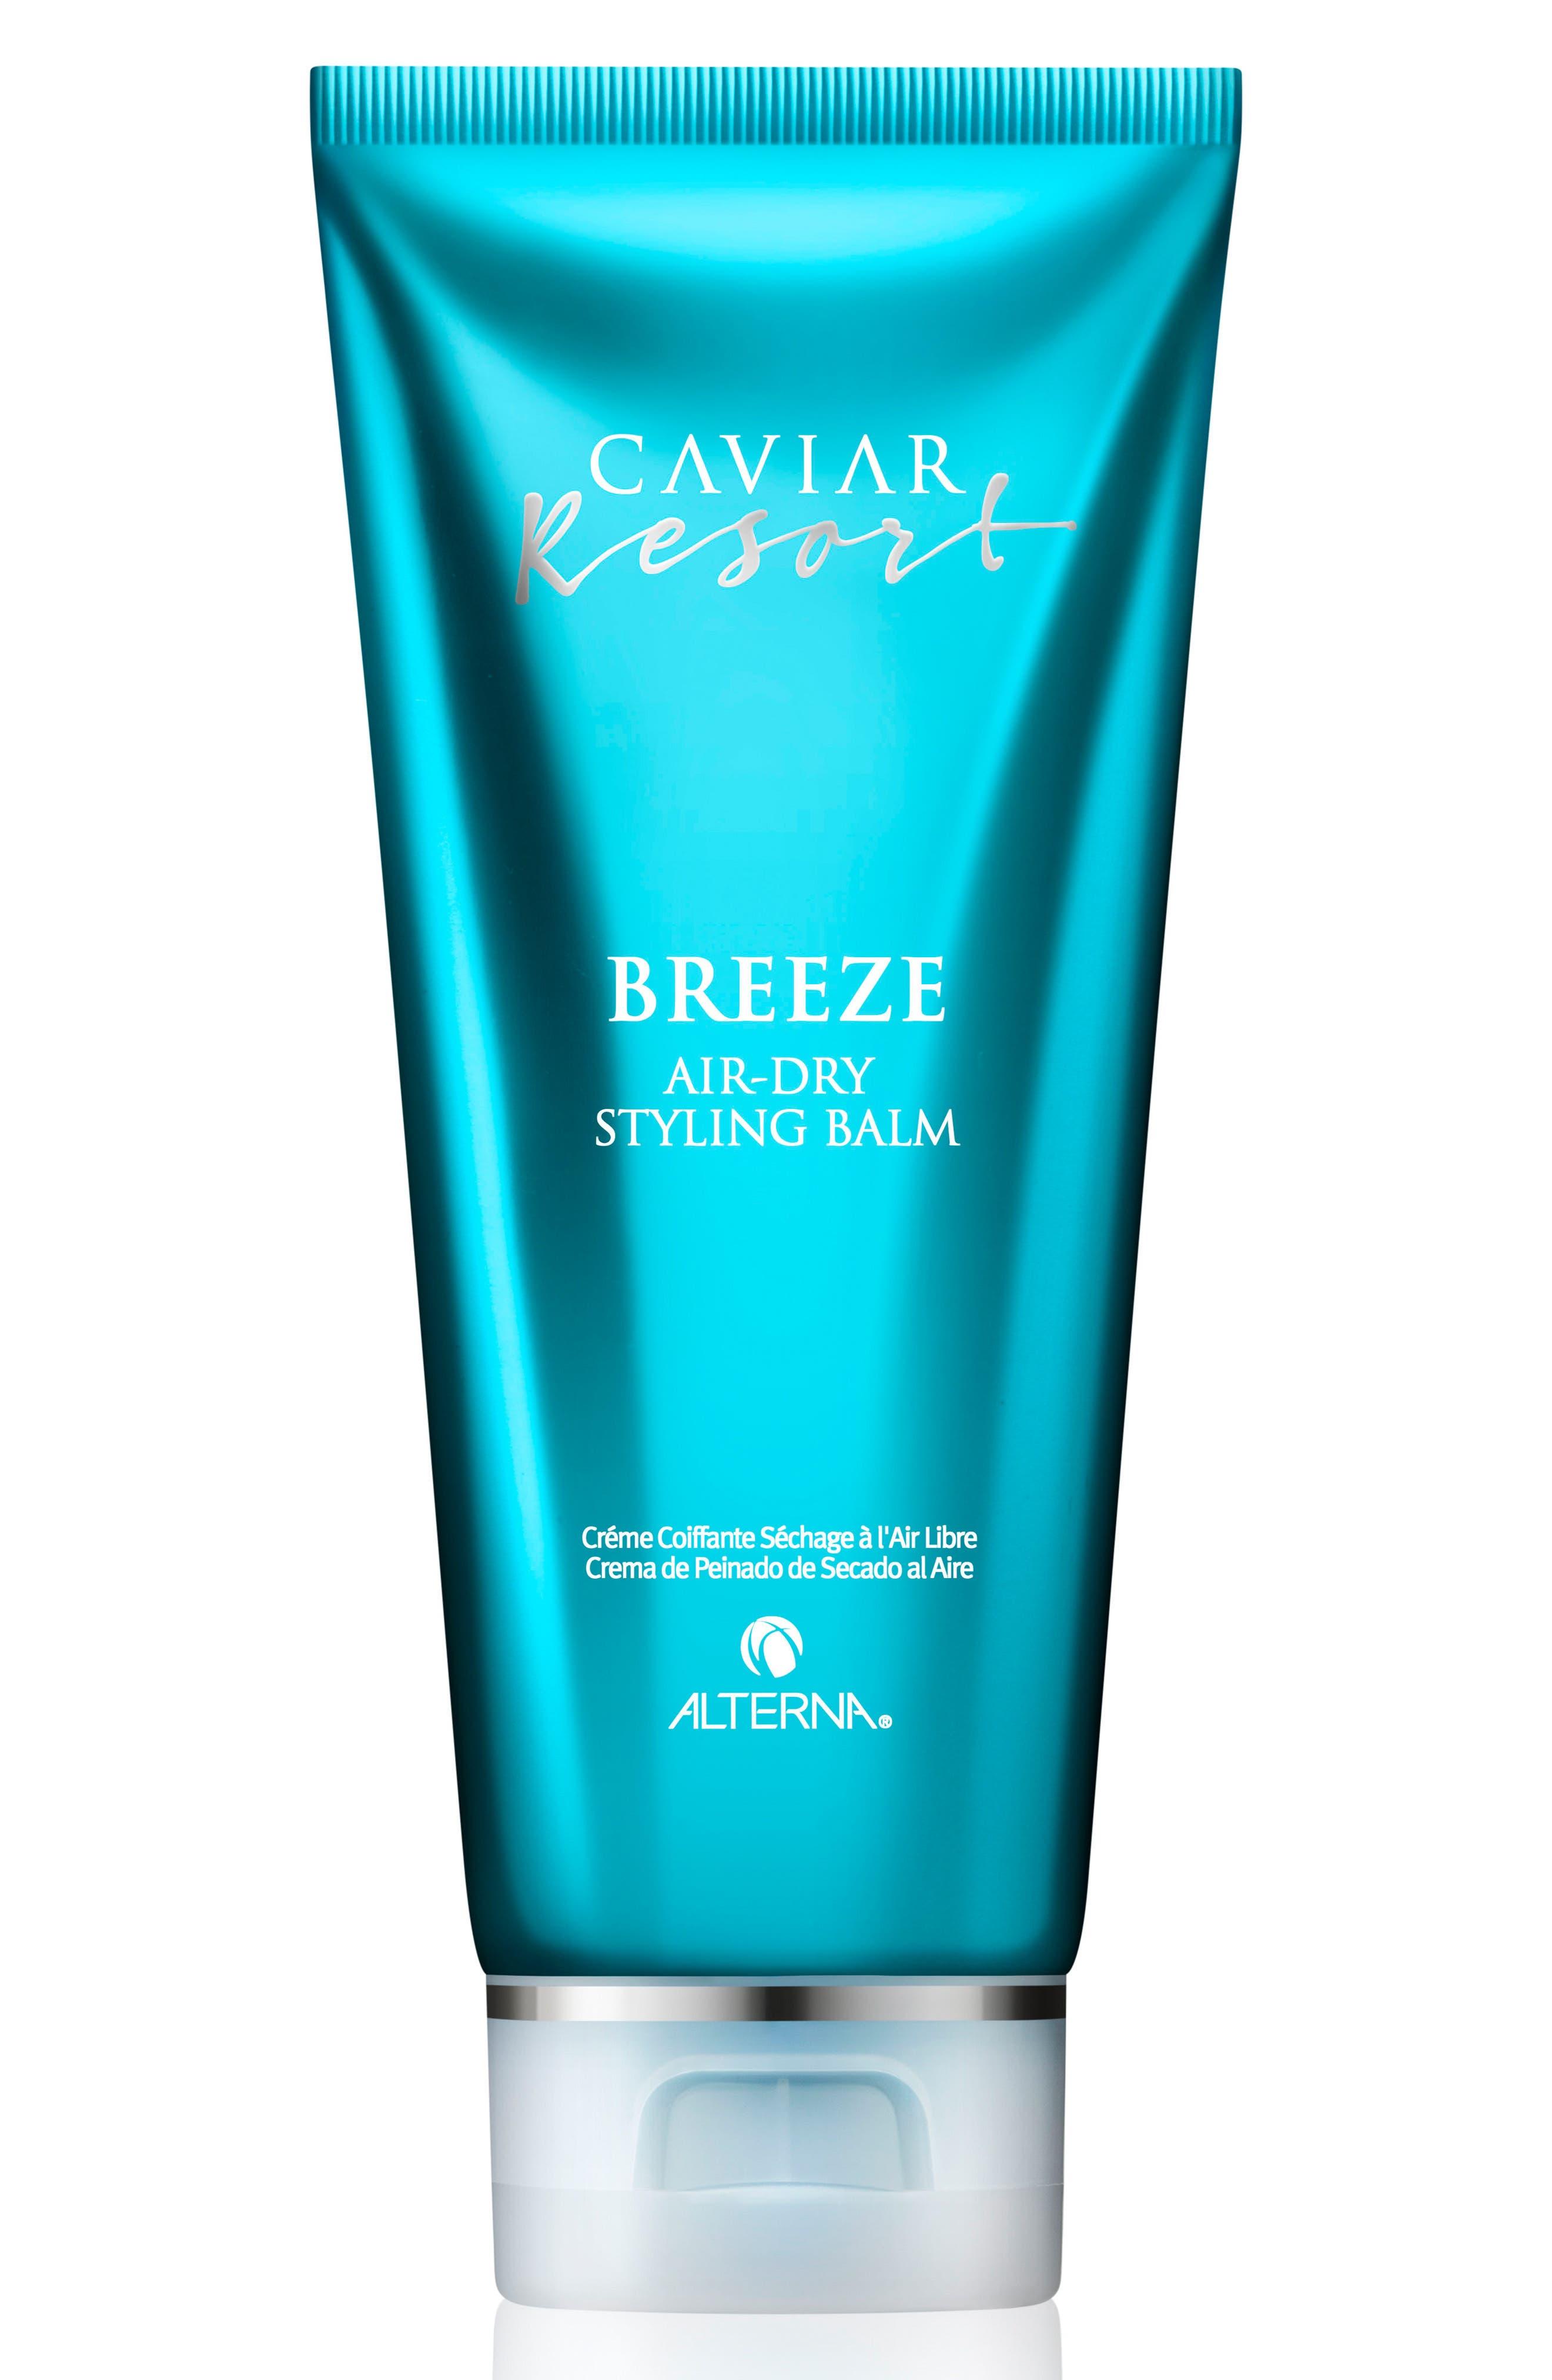 Caviar Resort Breeze Air-Dry Styling Balm,                         Main,                         color, 000